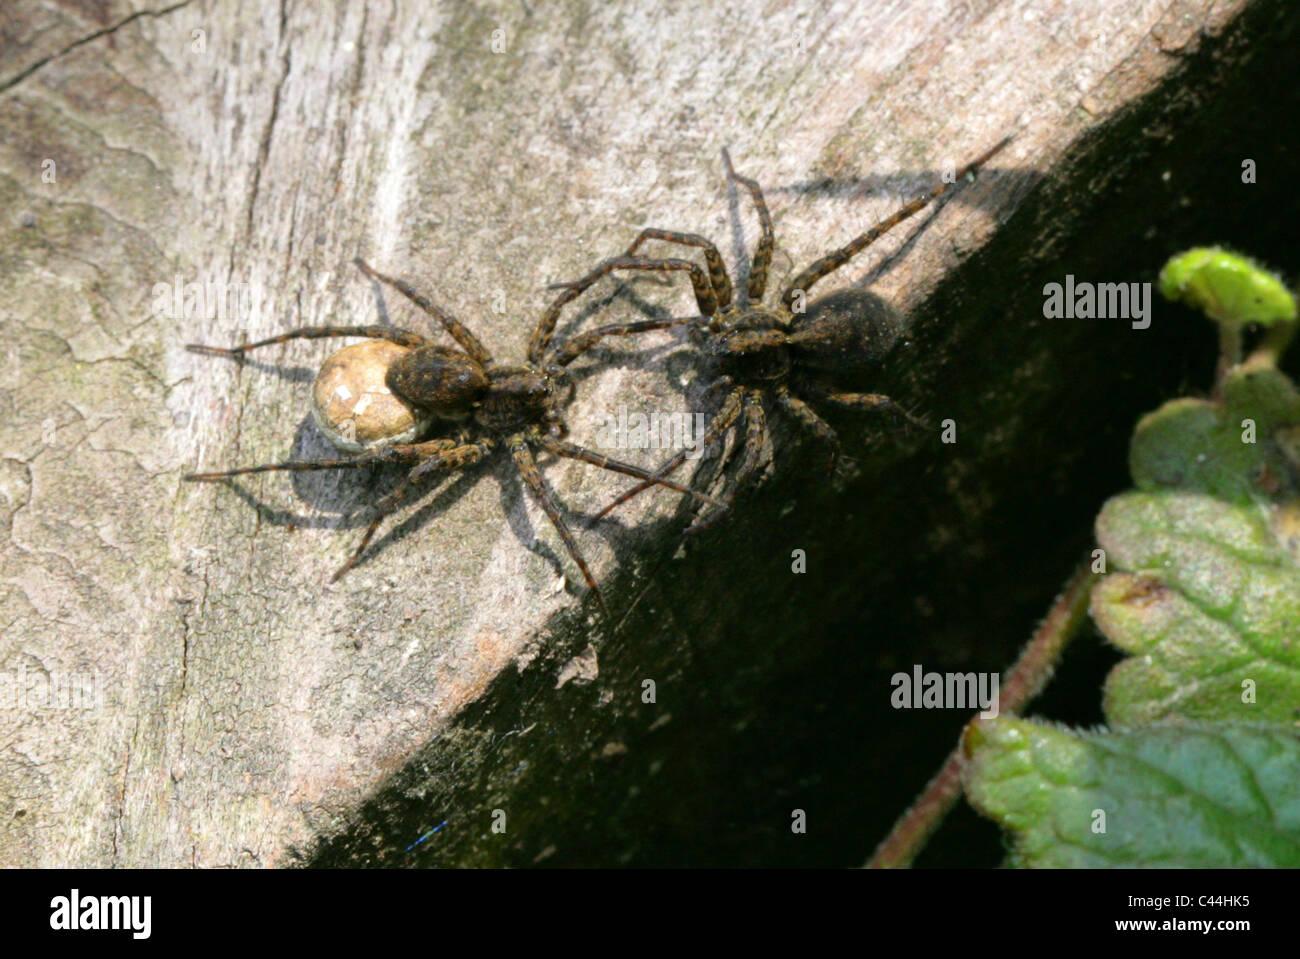 Male and Female Wolf Spider with Egg Sack, Pardosa lugubris, Lycosidae (wolf spiders), Araneae (spiders), Arachnida - Stock Image